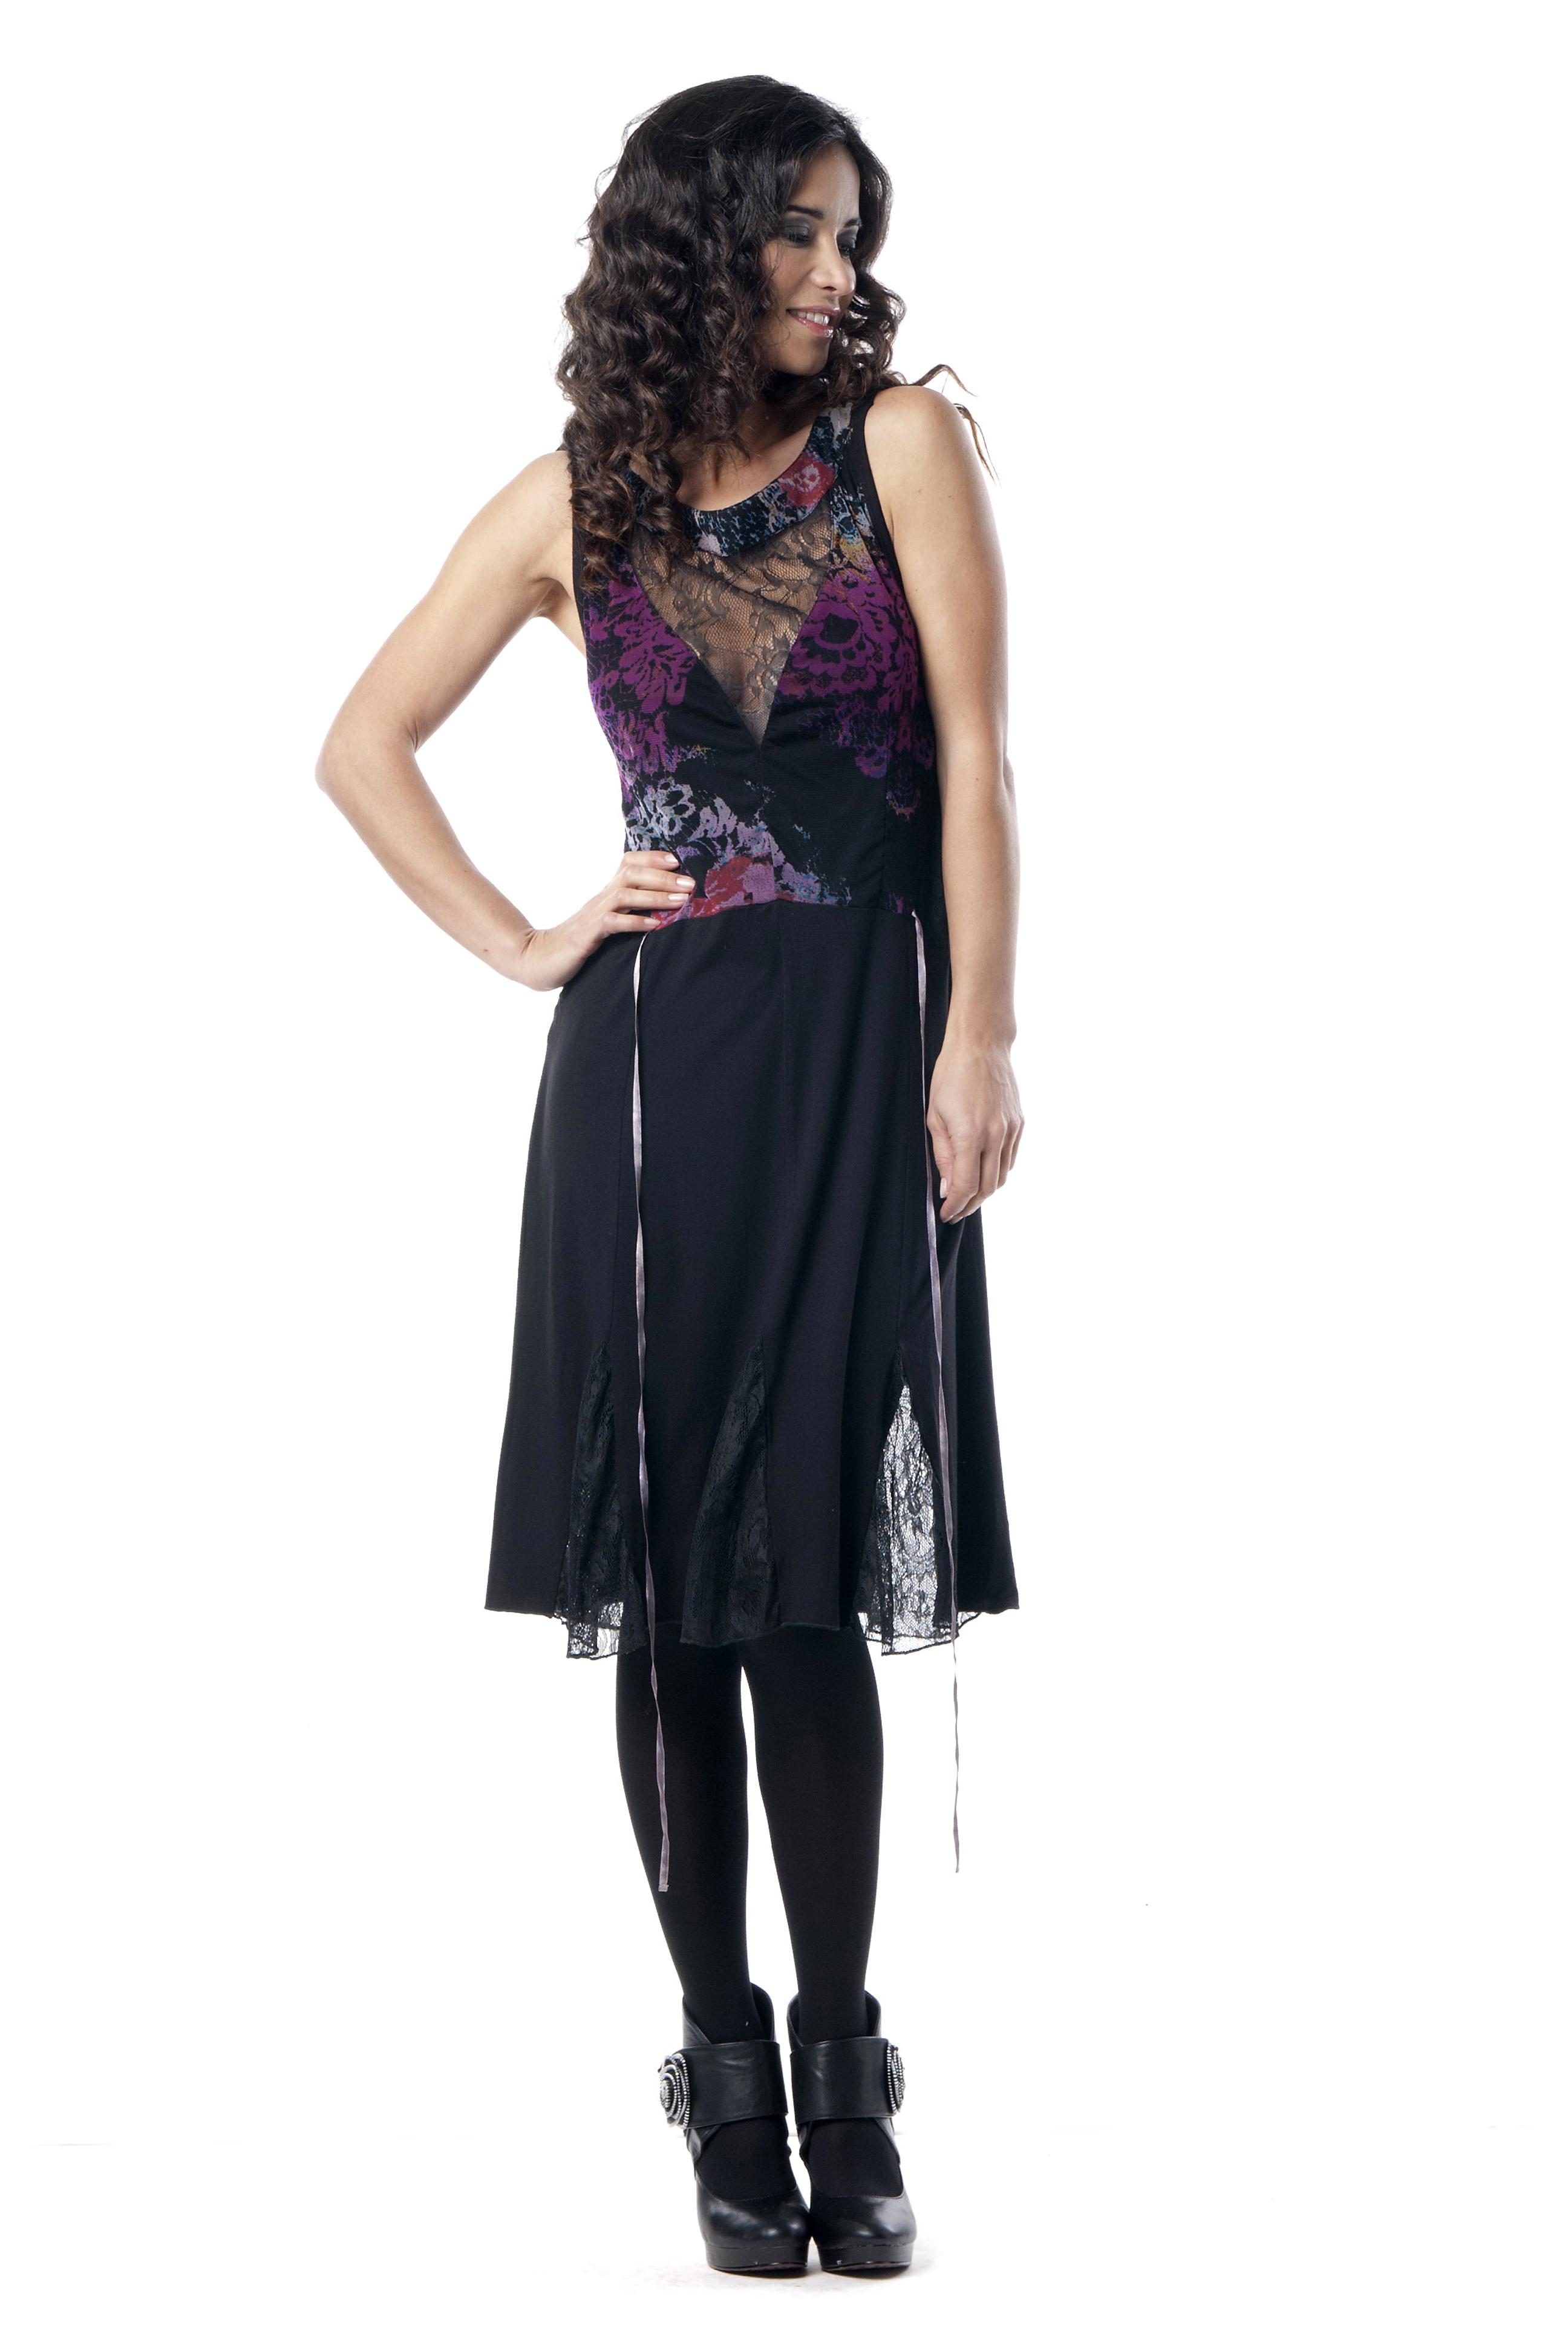 Les Fees Du Vent Couture: Sexy Sorcery Dress (1 Left!) LFDV_887310